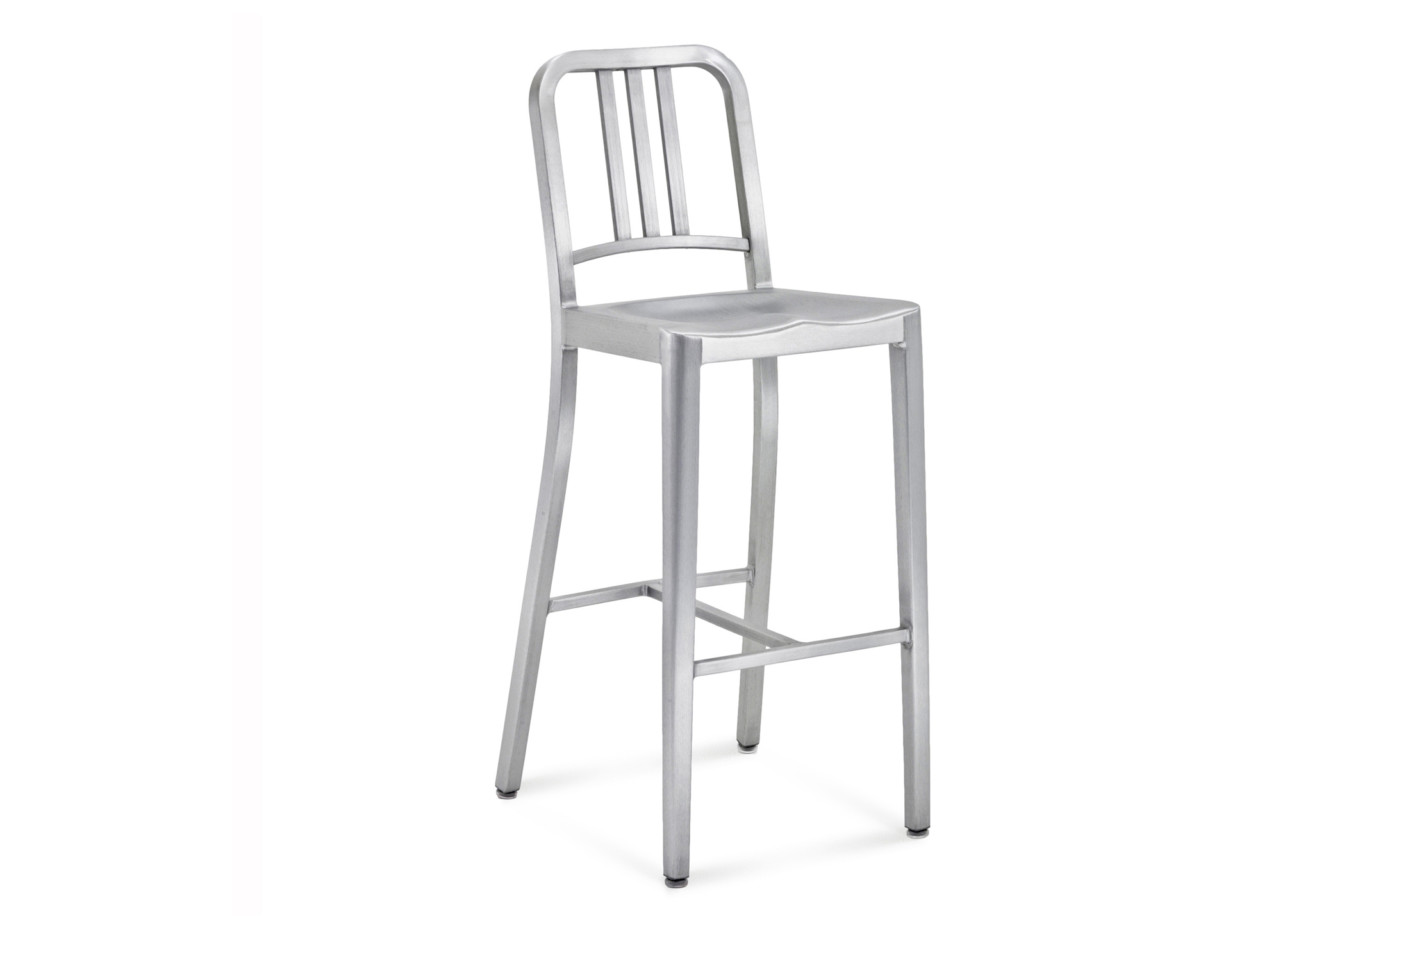 Best Interior Ideas kingofficeus : navy bar stool 1 from kingoffice.us size 1410 x 971 jpeg 51kB